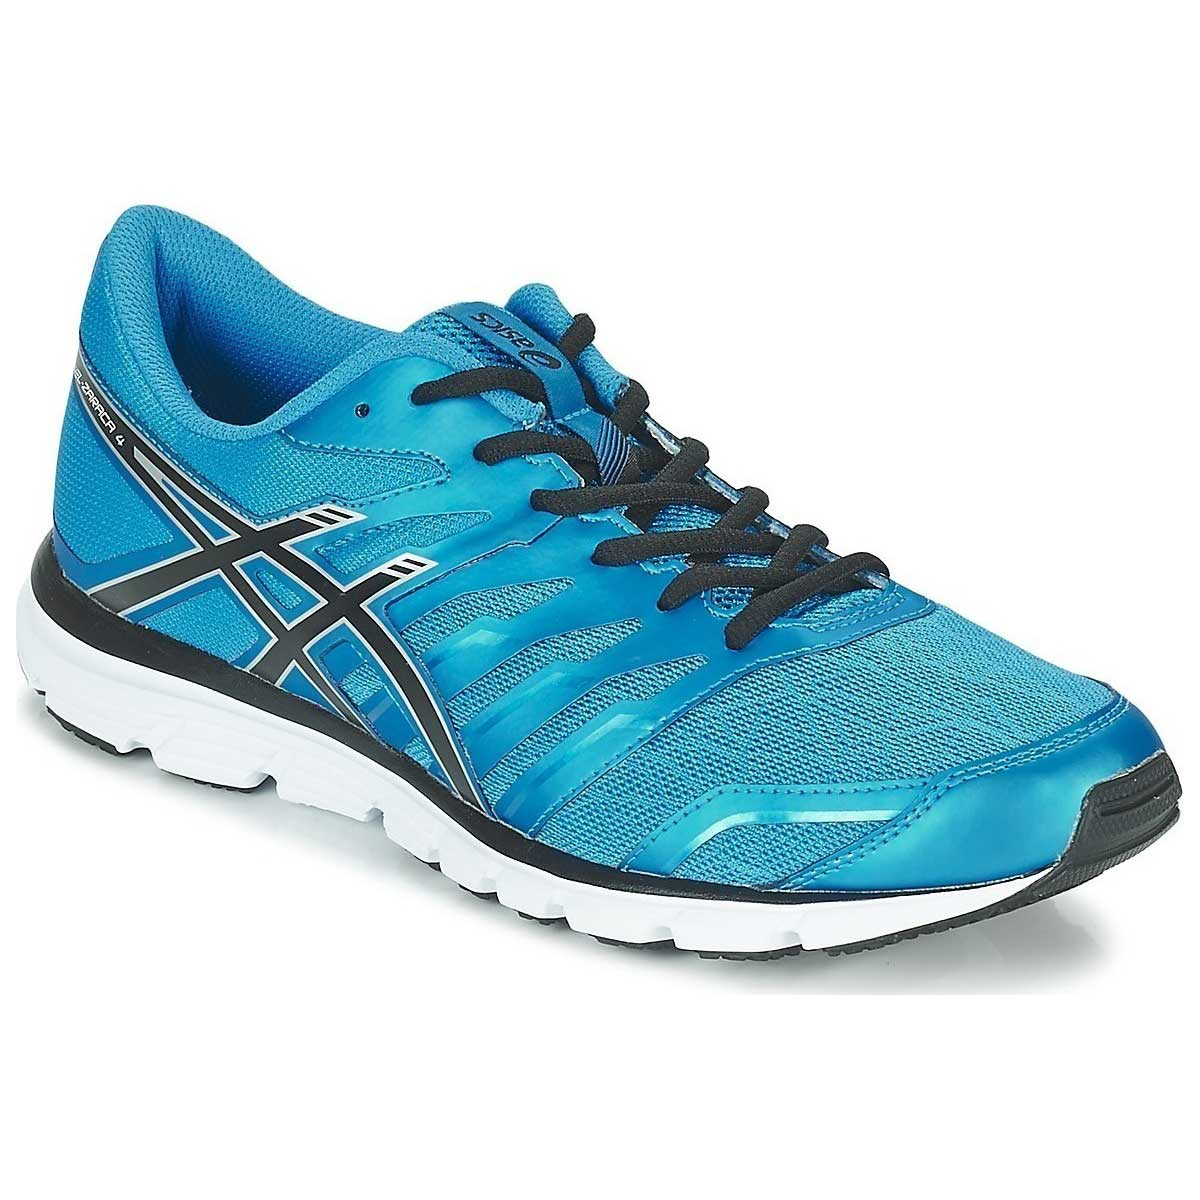 Running Asics Shoesmethyl Gel 4 Blueblacksilver Zaraca iZkTOuwPX